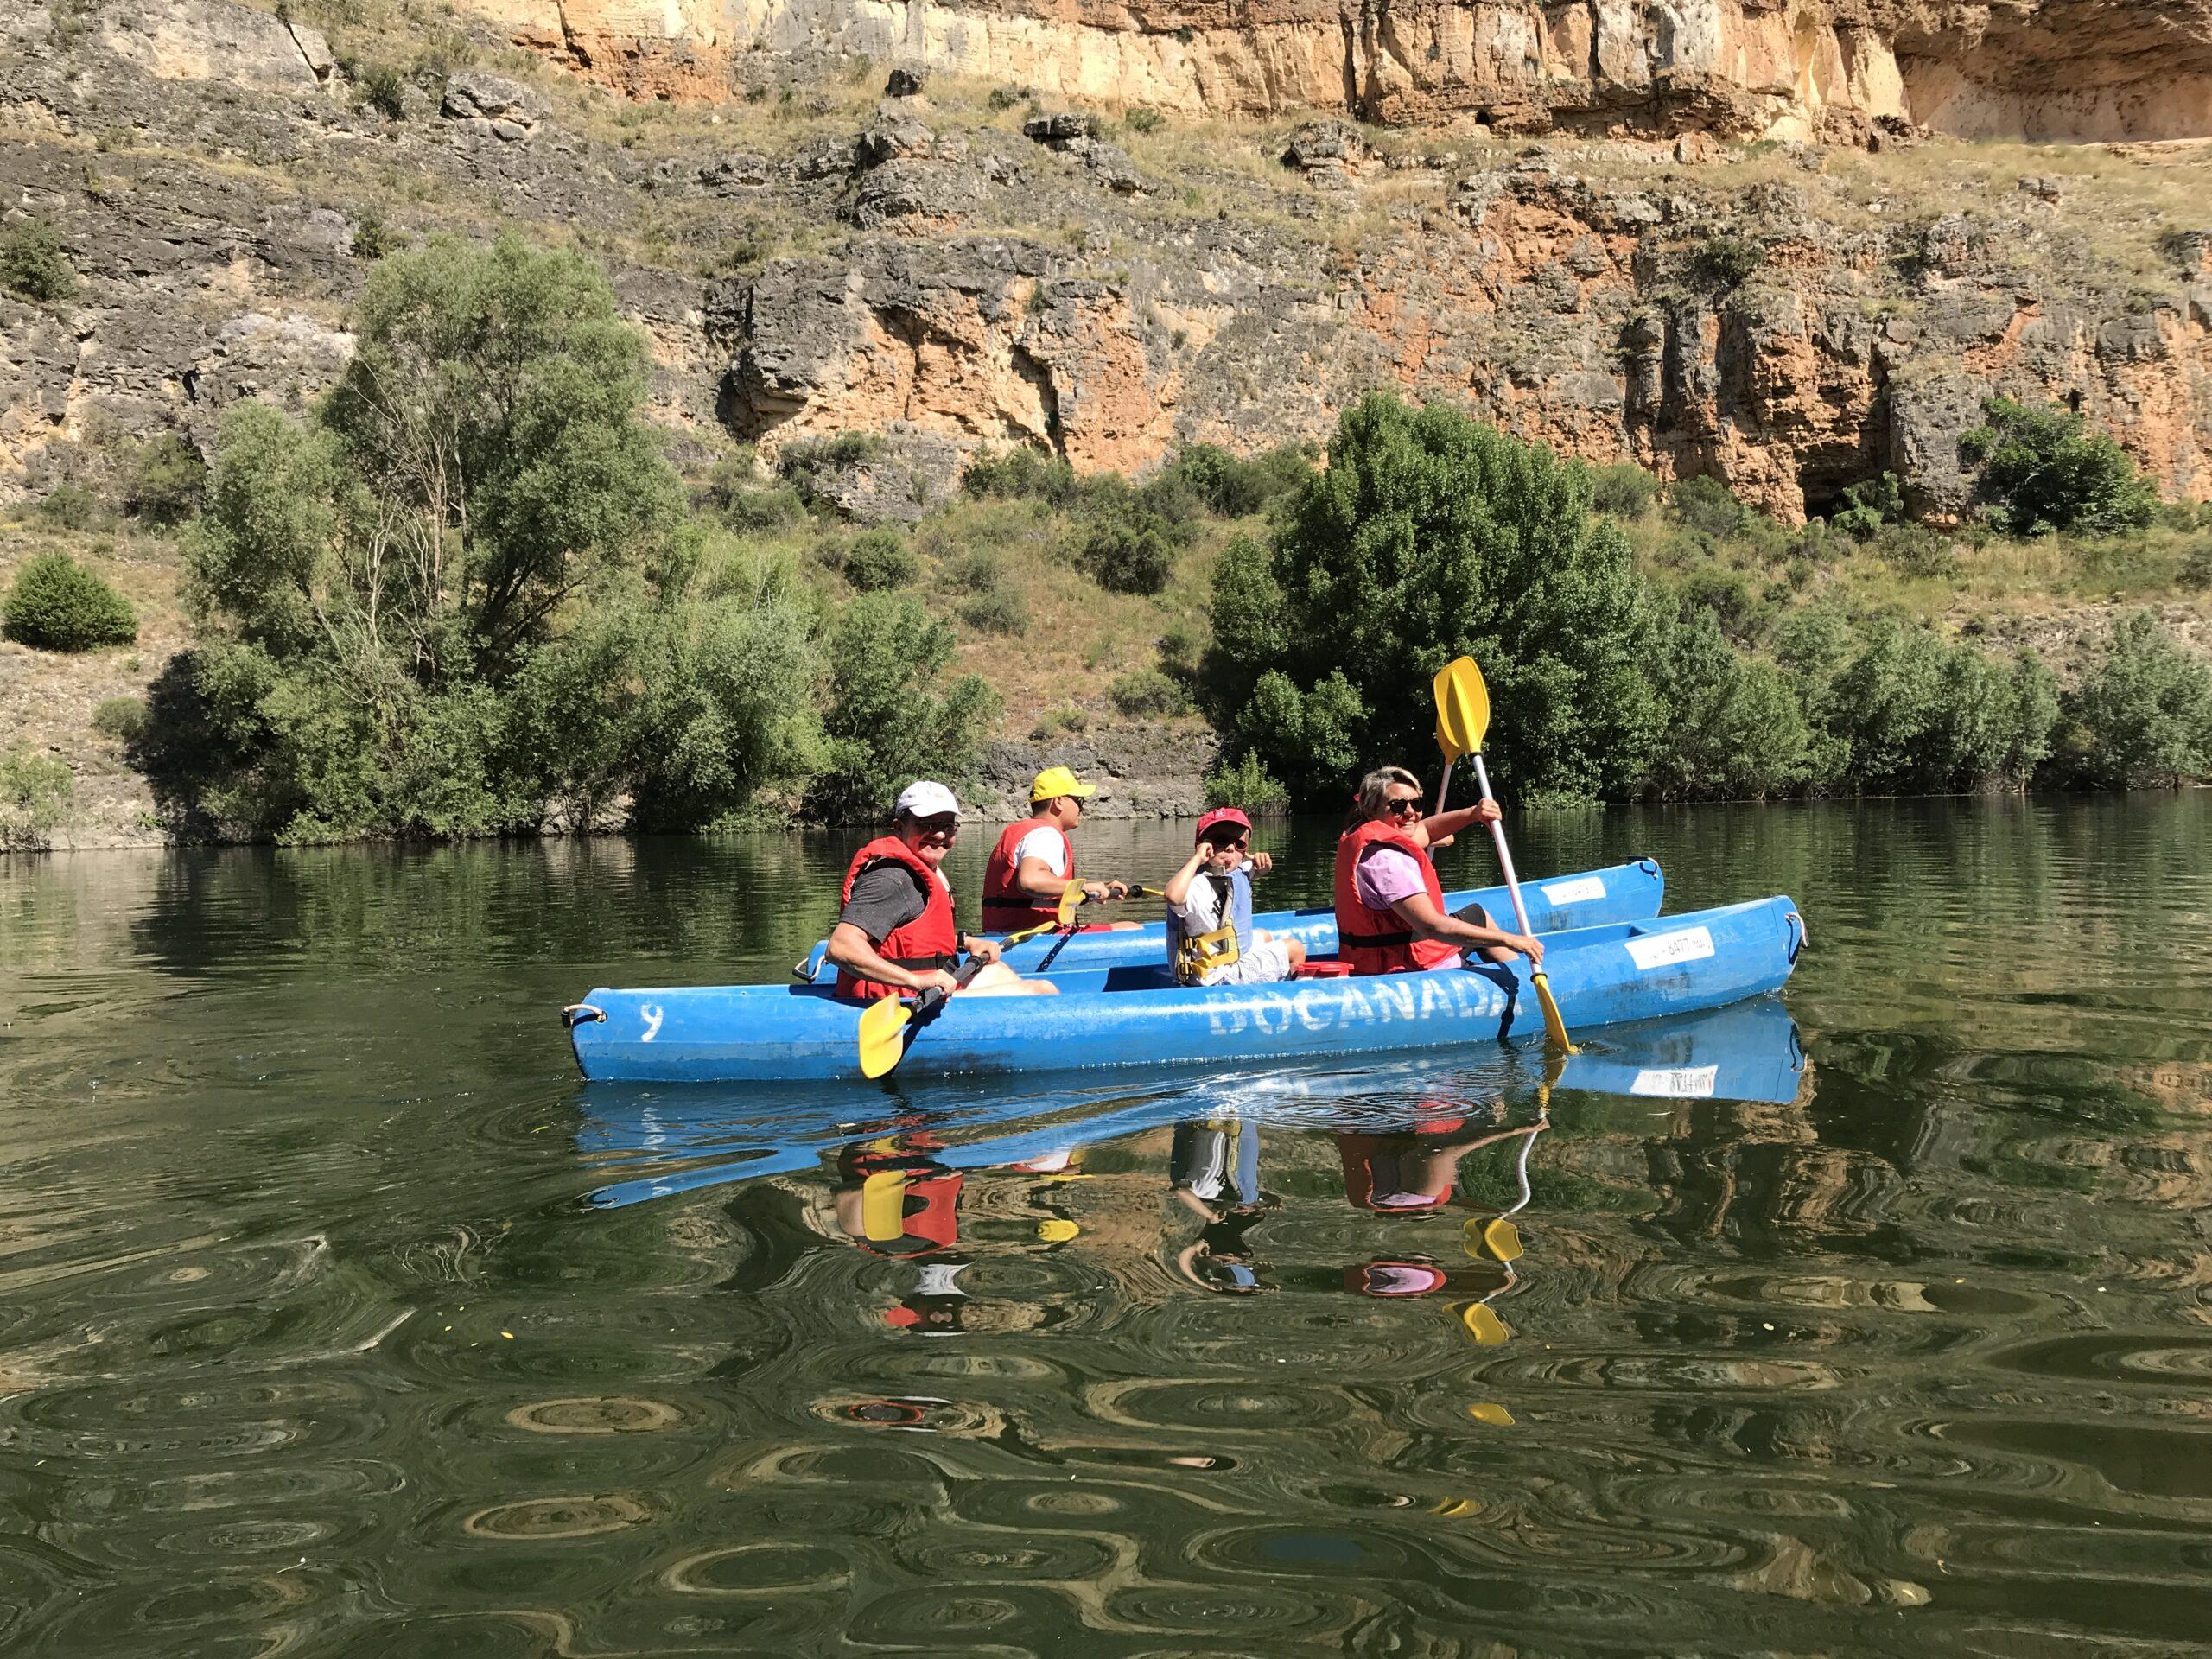 Explore The River Duratón Natural Reserve In Segovia In Our Segovia Kayaking Adventure